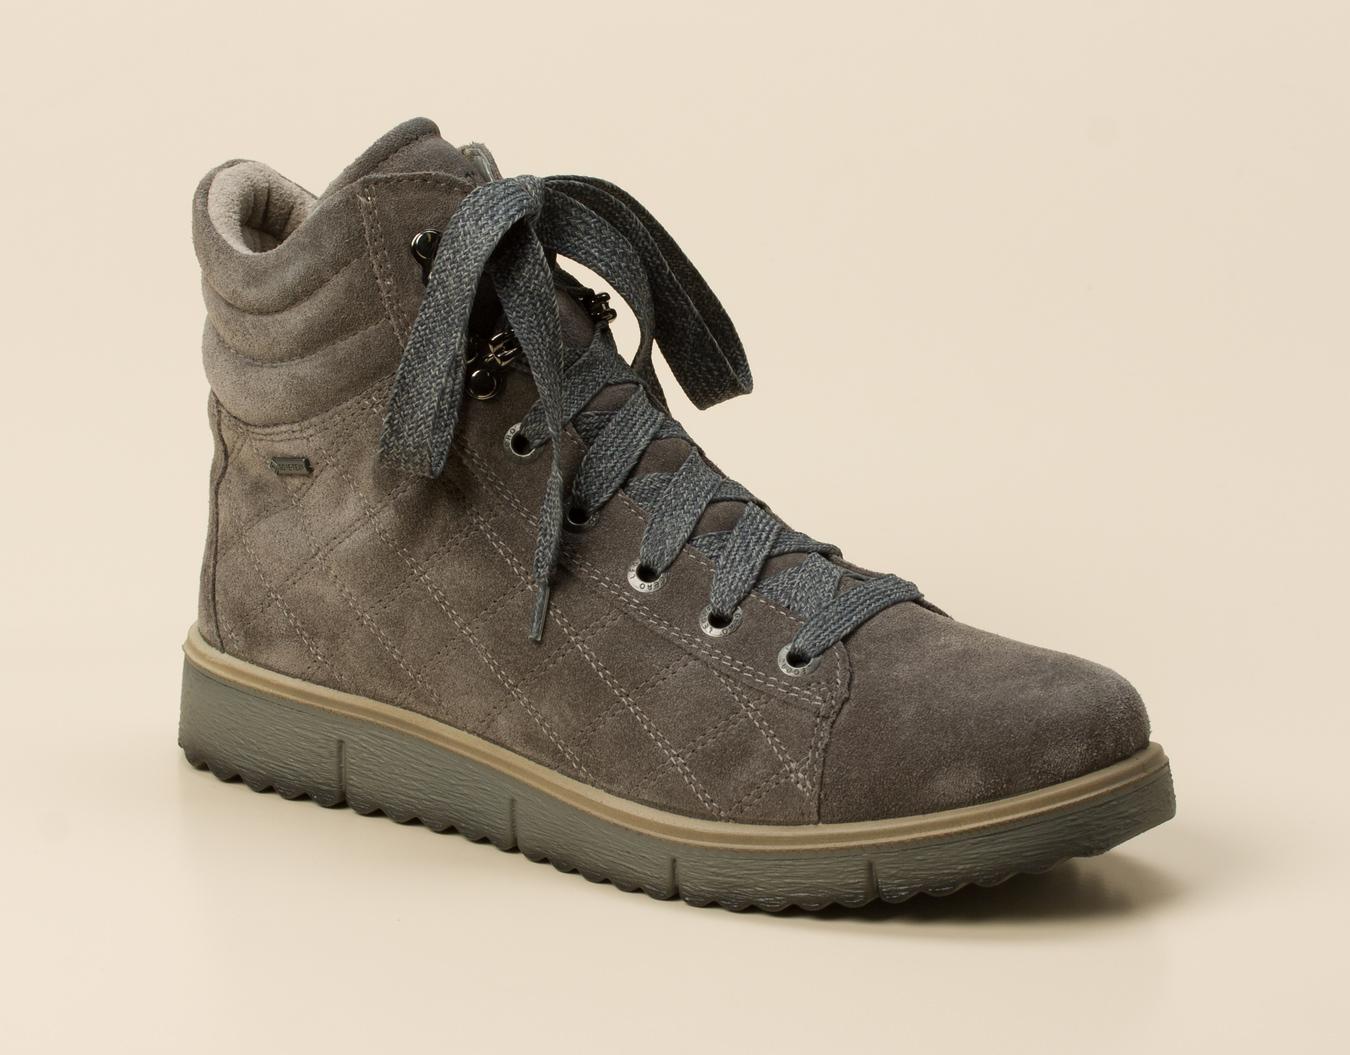 Kleidung & Accessoires Legero Damen Schuhe Stiefel